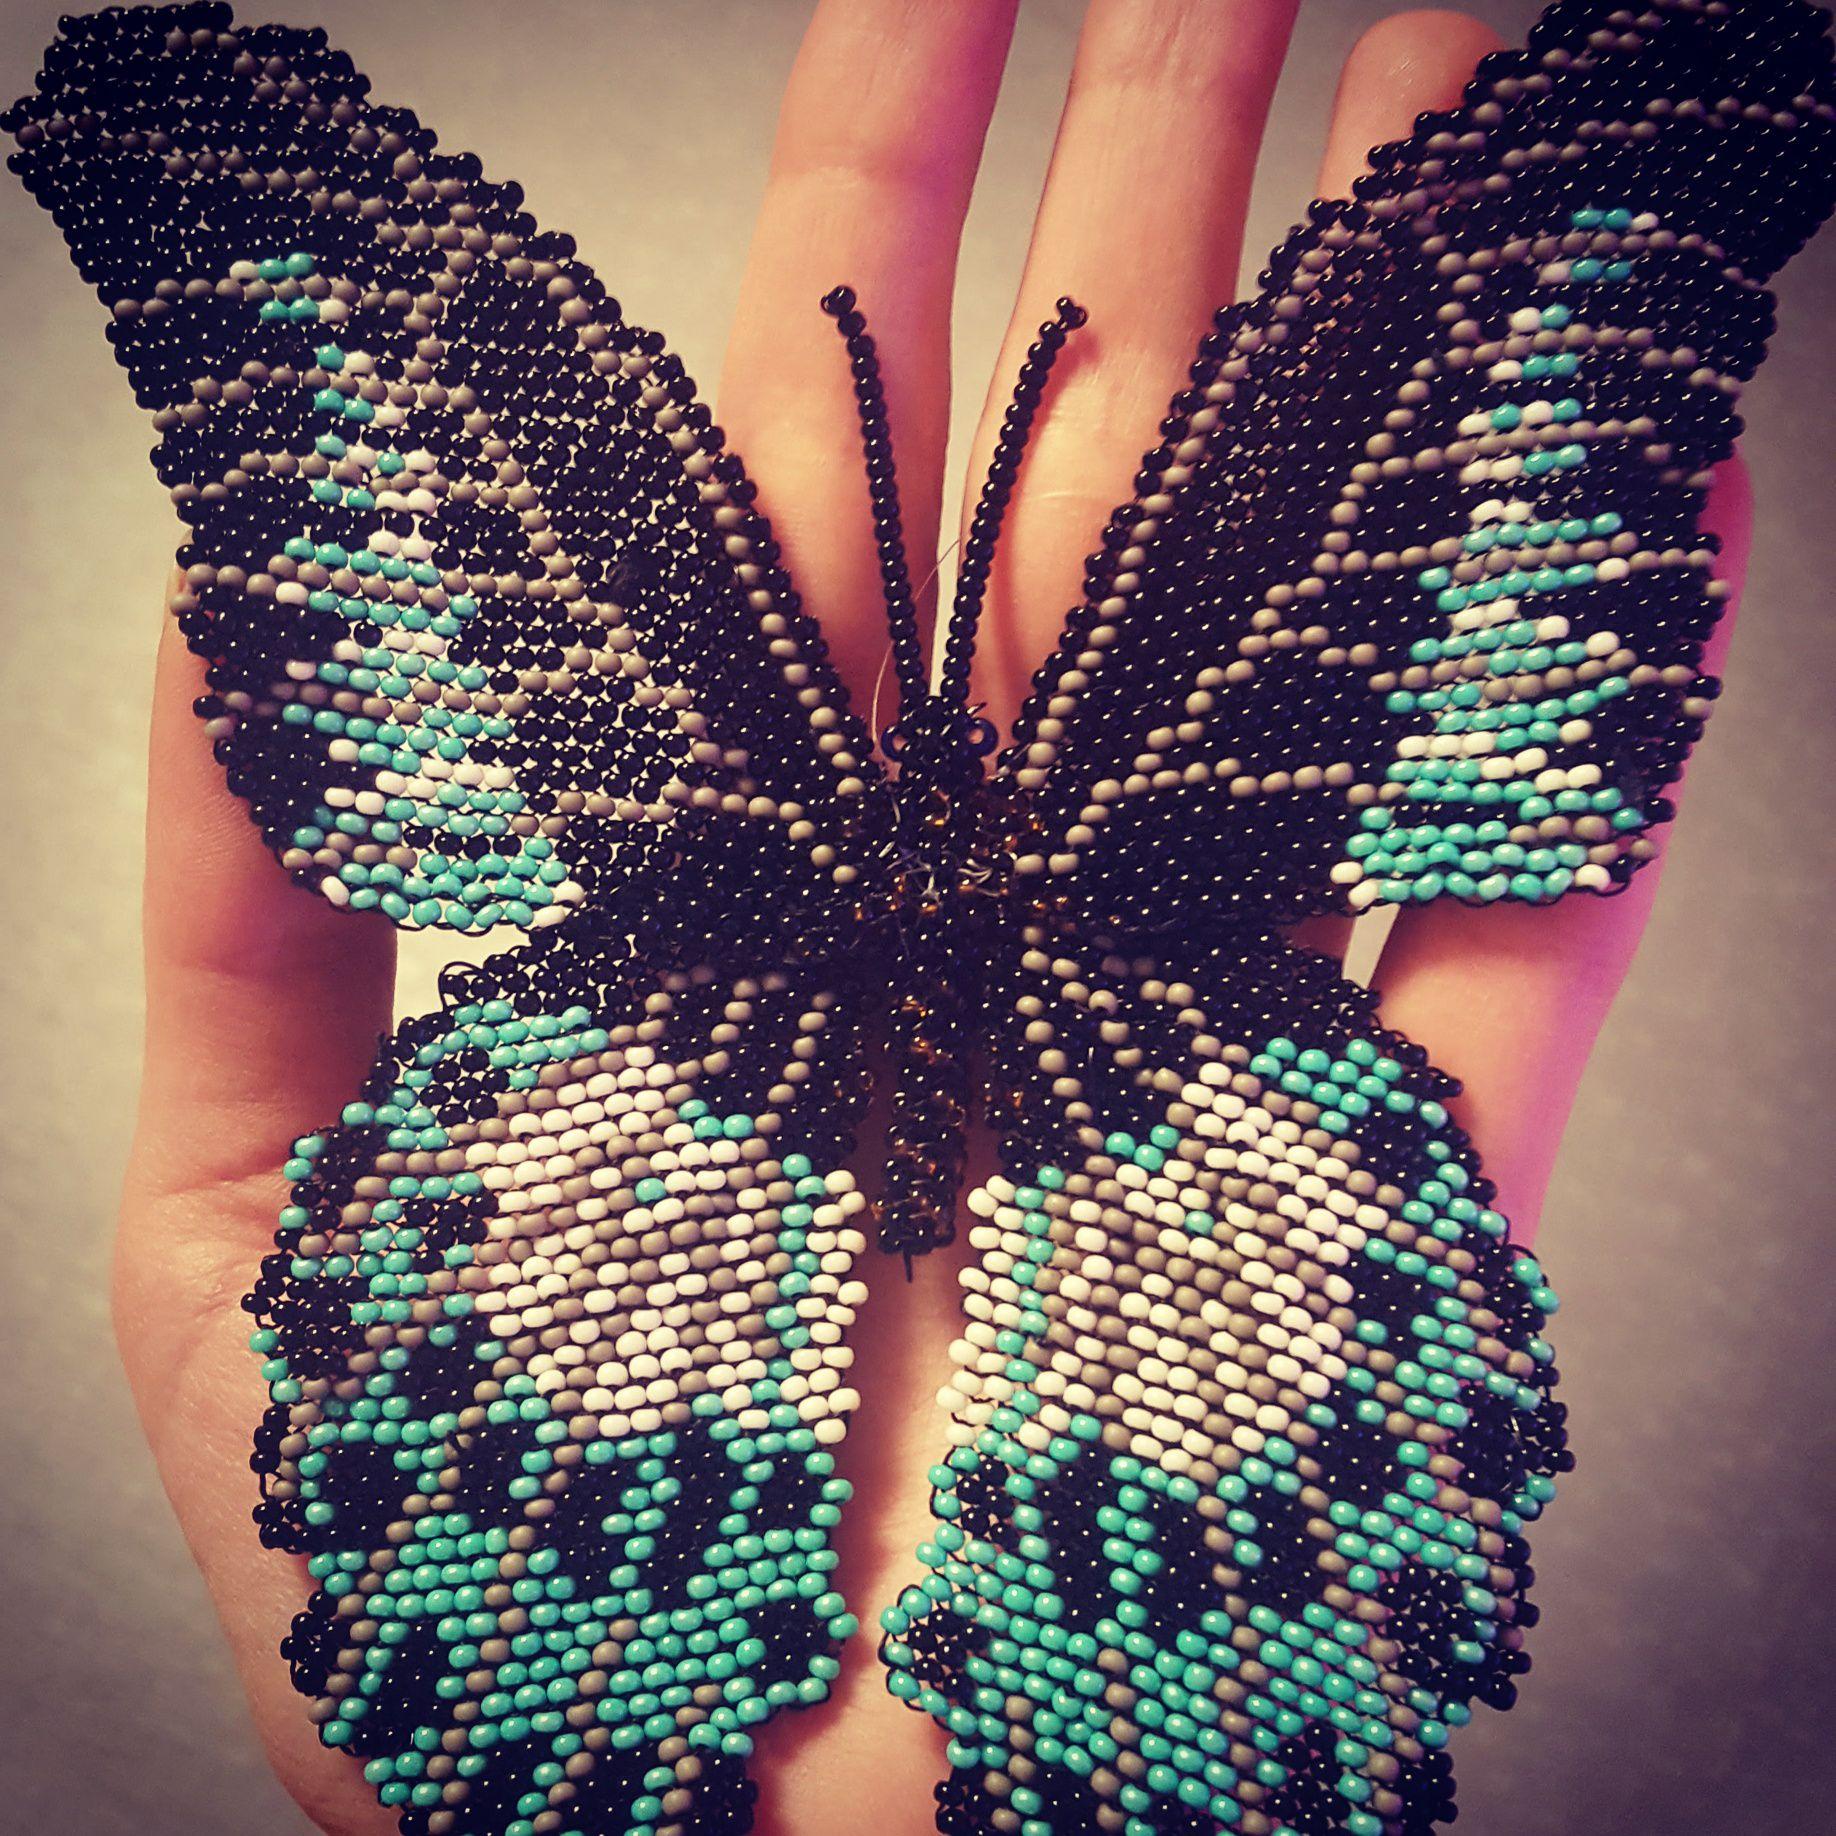 излелияизбсера интерьер украшкние бабочка